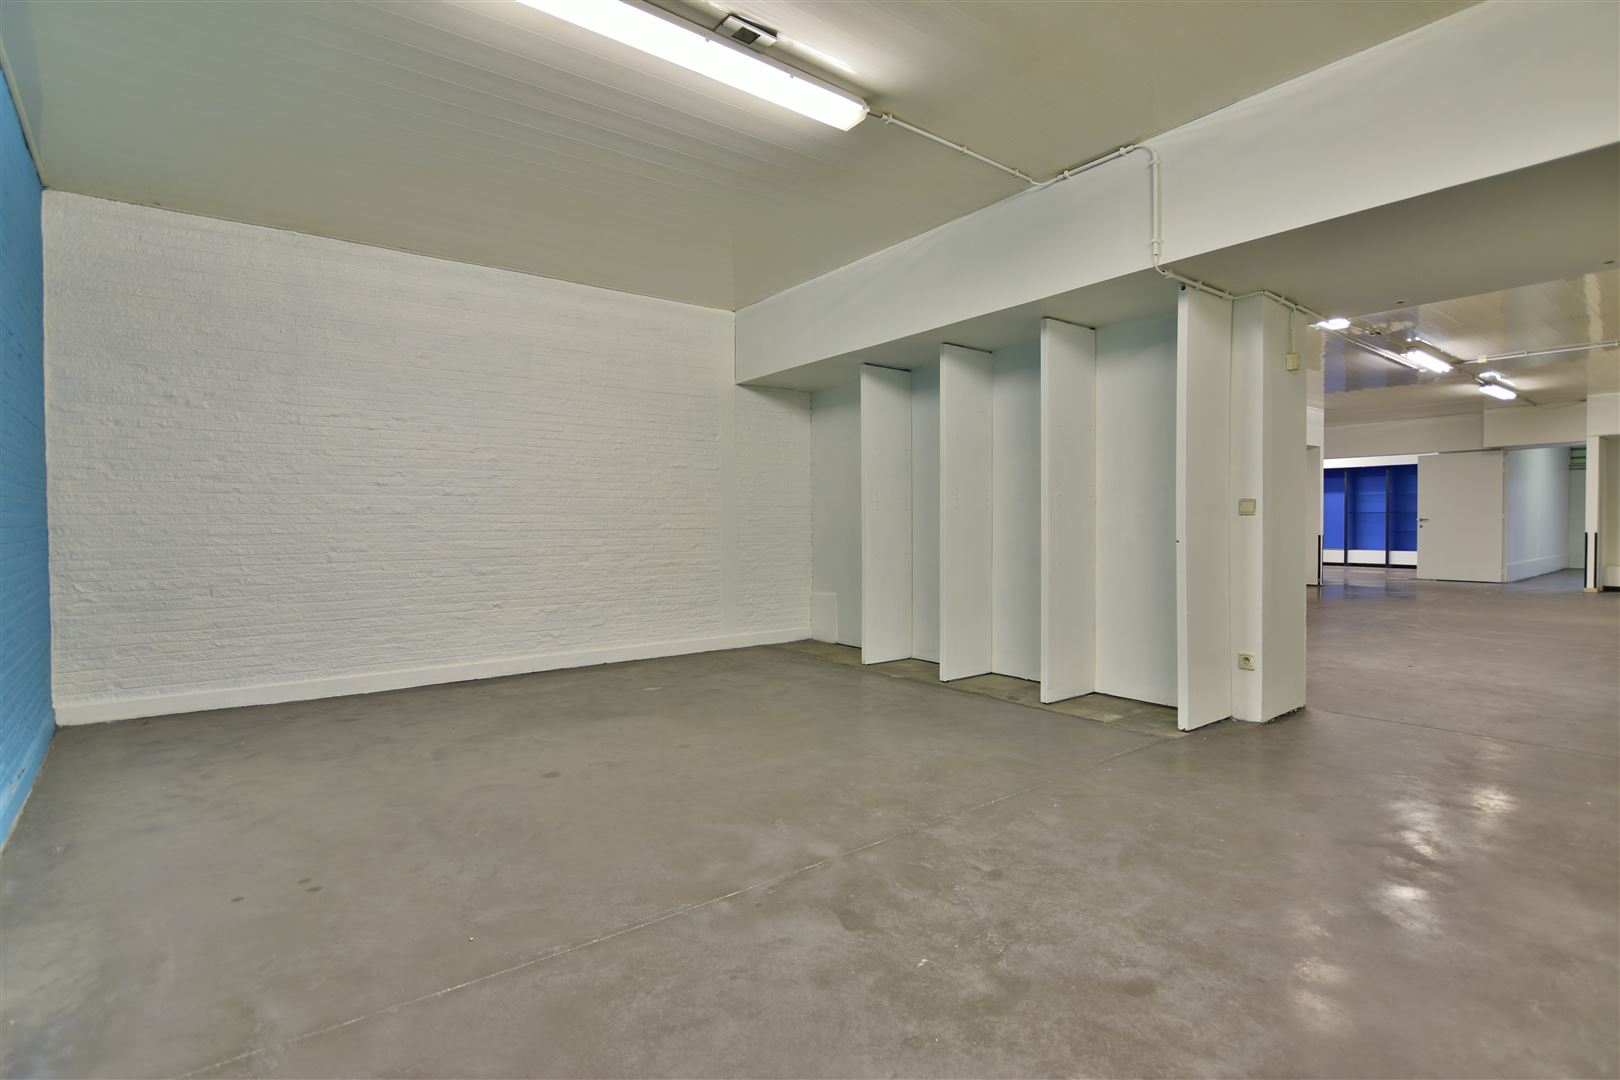 Foto 12 : Kantoorruimte te 9220 HAMME (België) - Prijs € 1.600